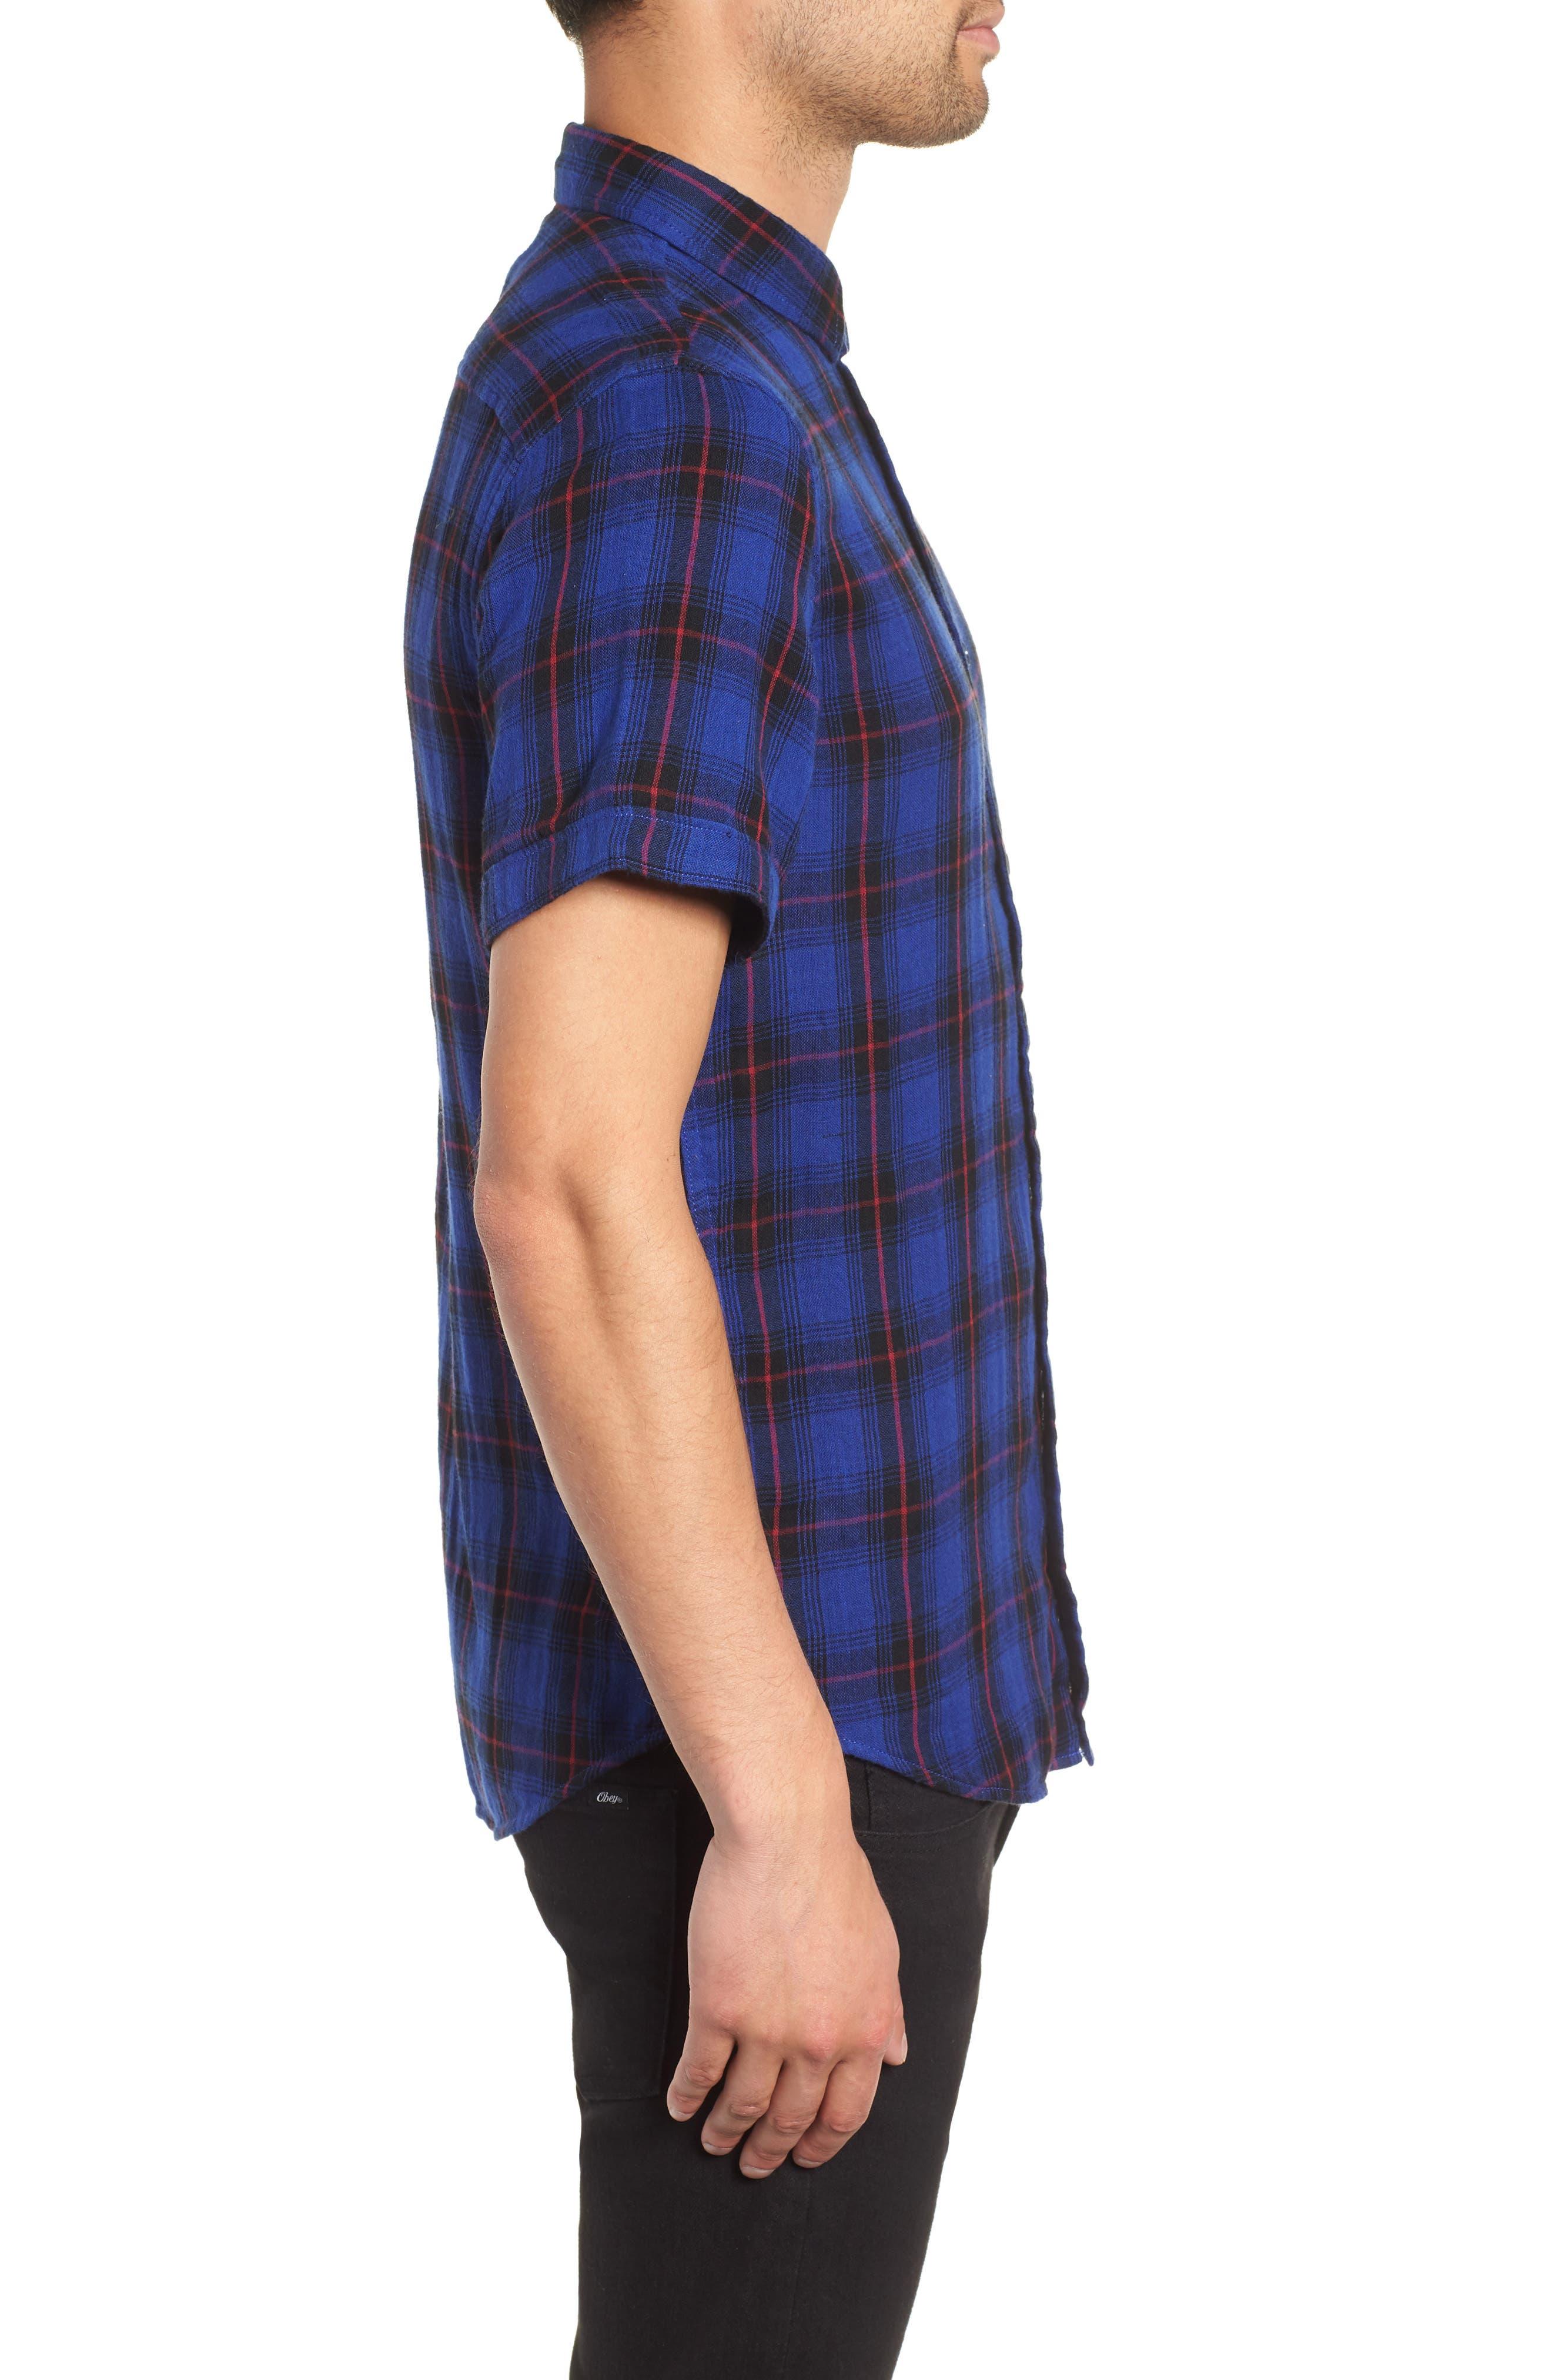 Plaid Woven Shirt,                             Alternate thumbnail 3, color,                             BLUE BLACK LUCA PLAID